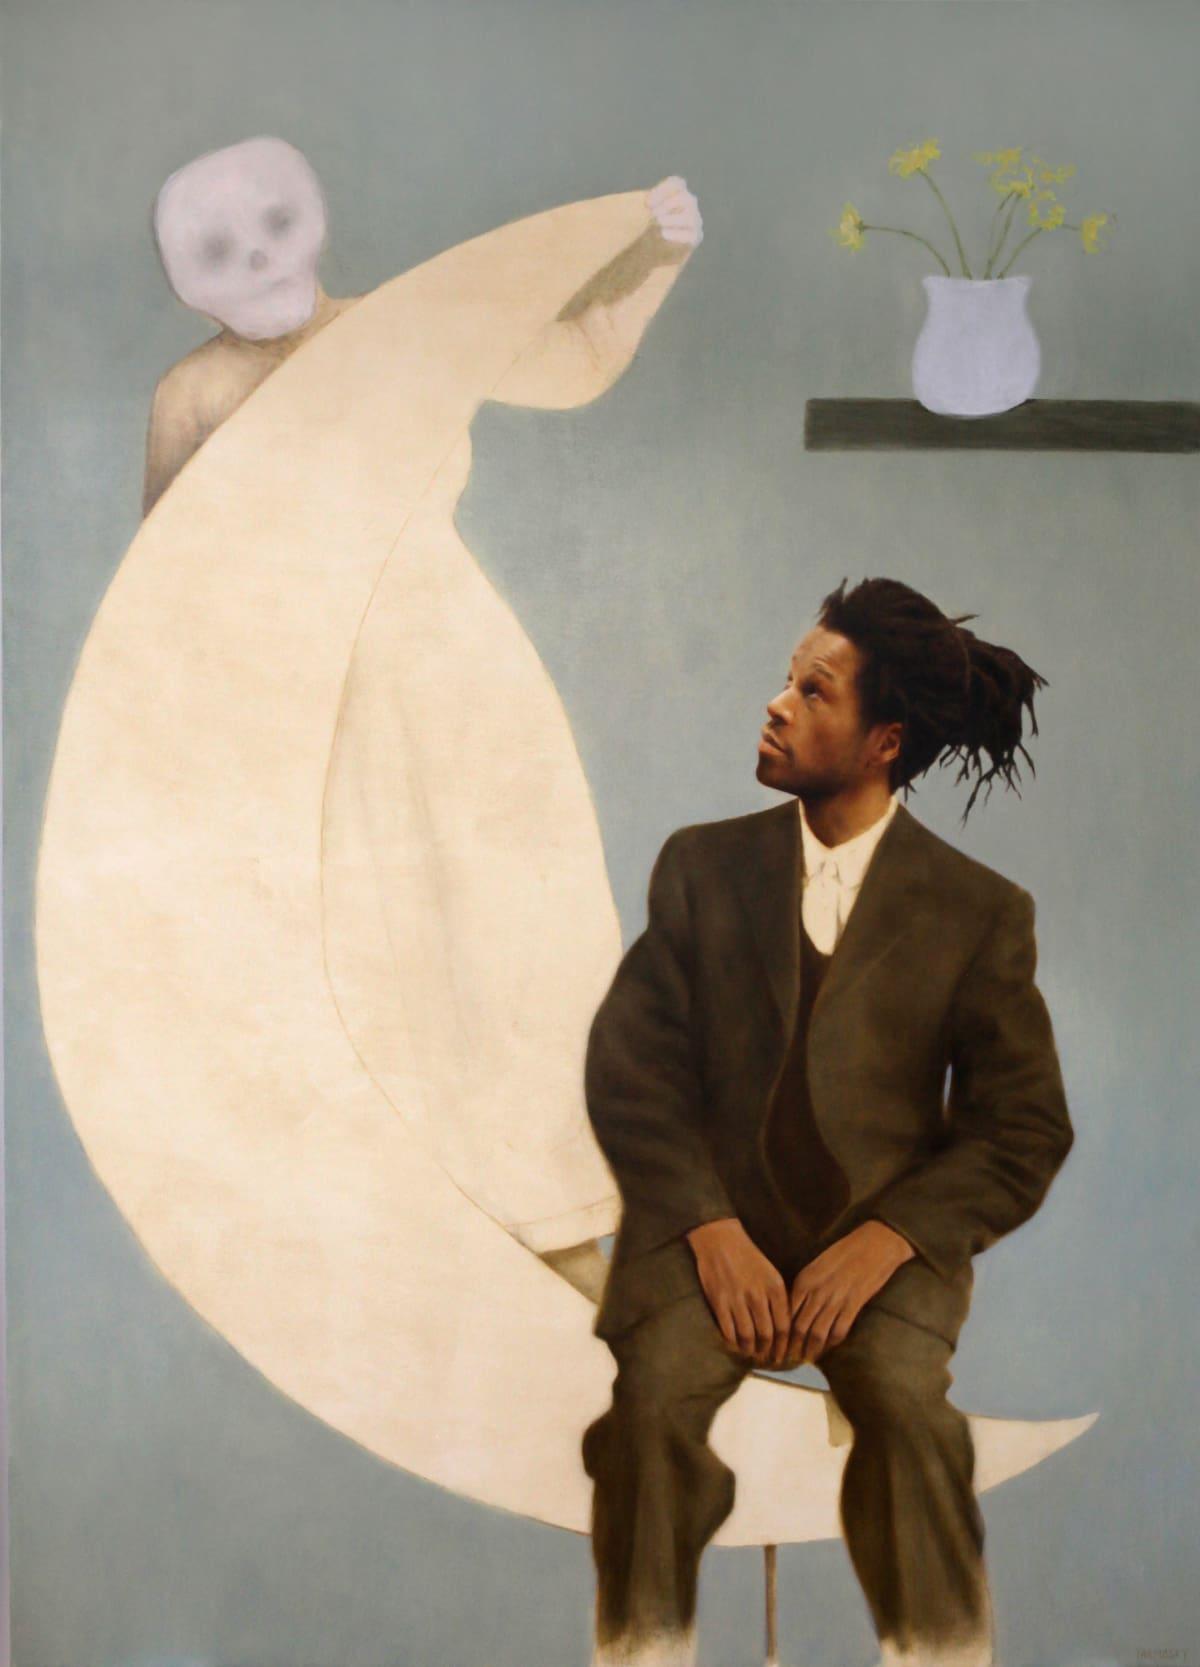 Jason Bard YARMOSKY, Paper moon, 2018